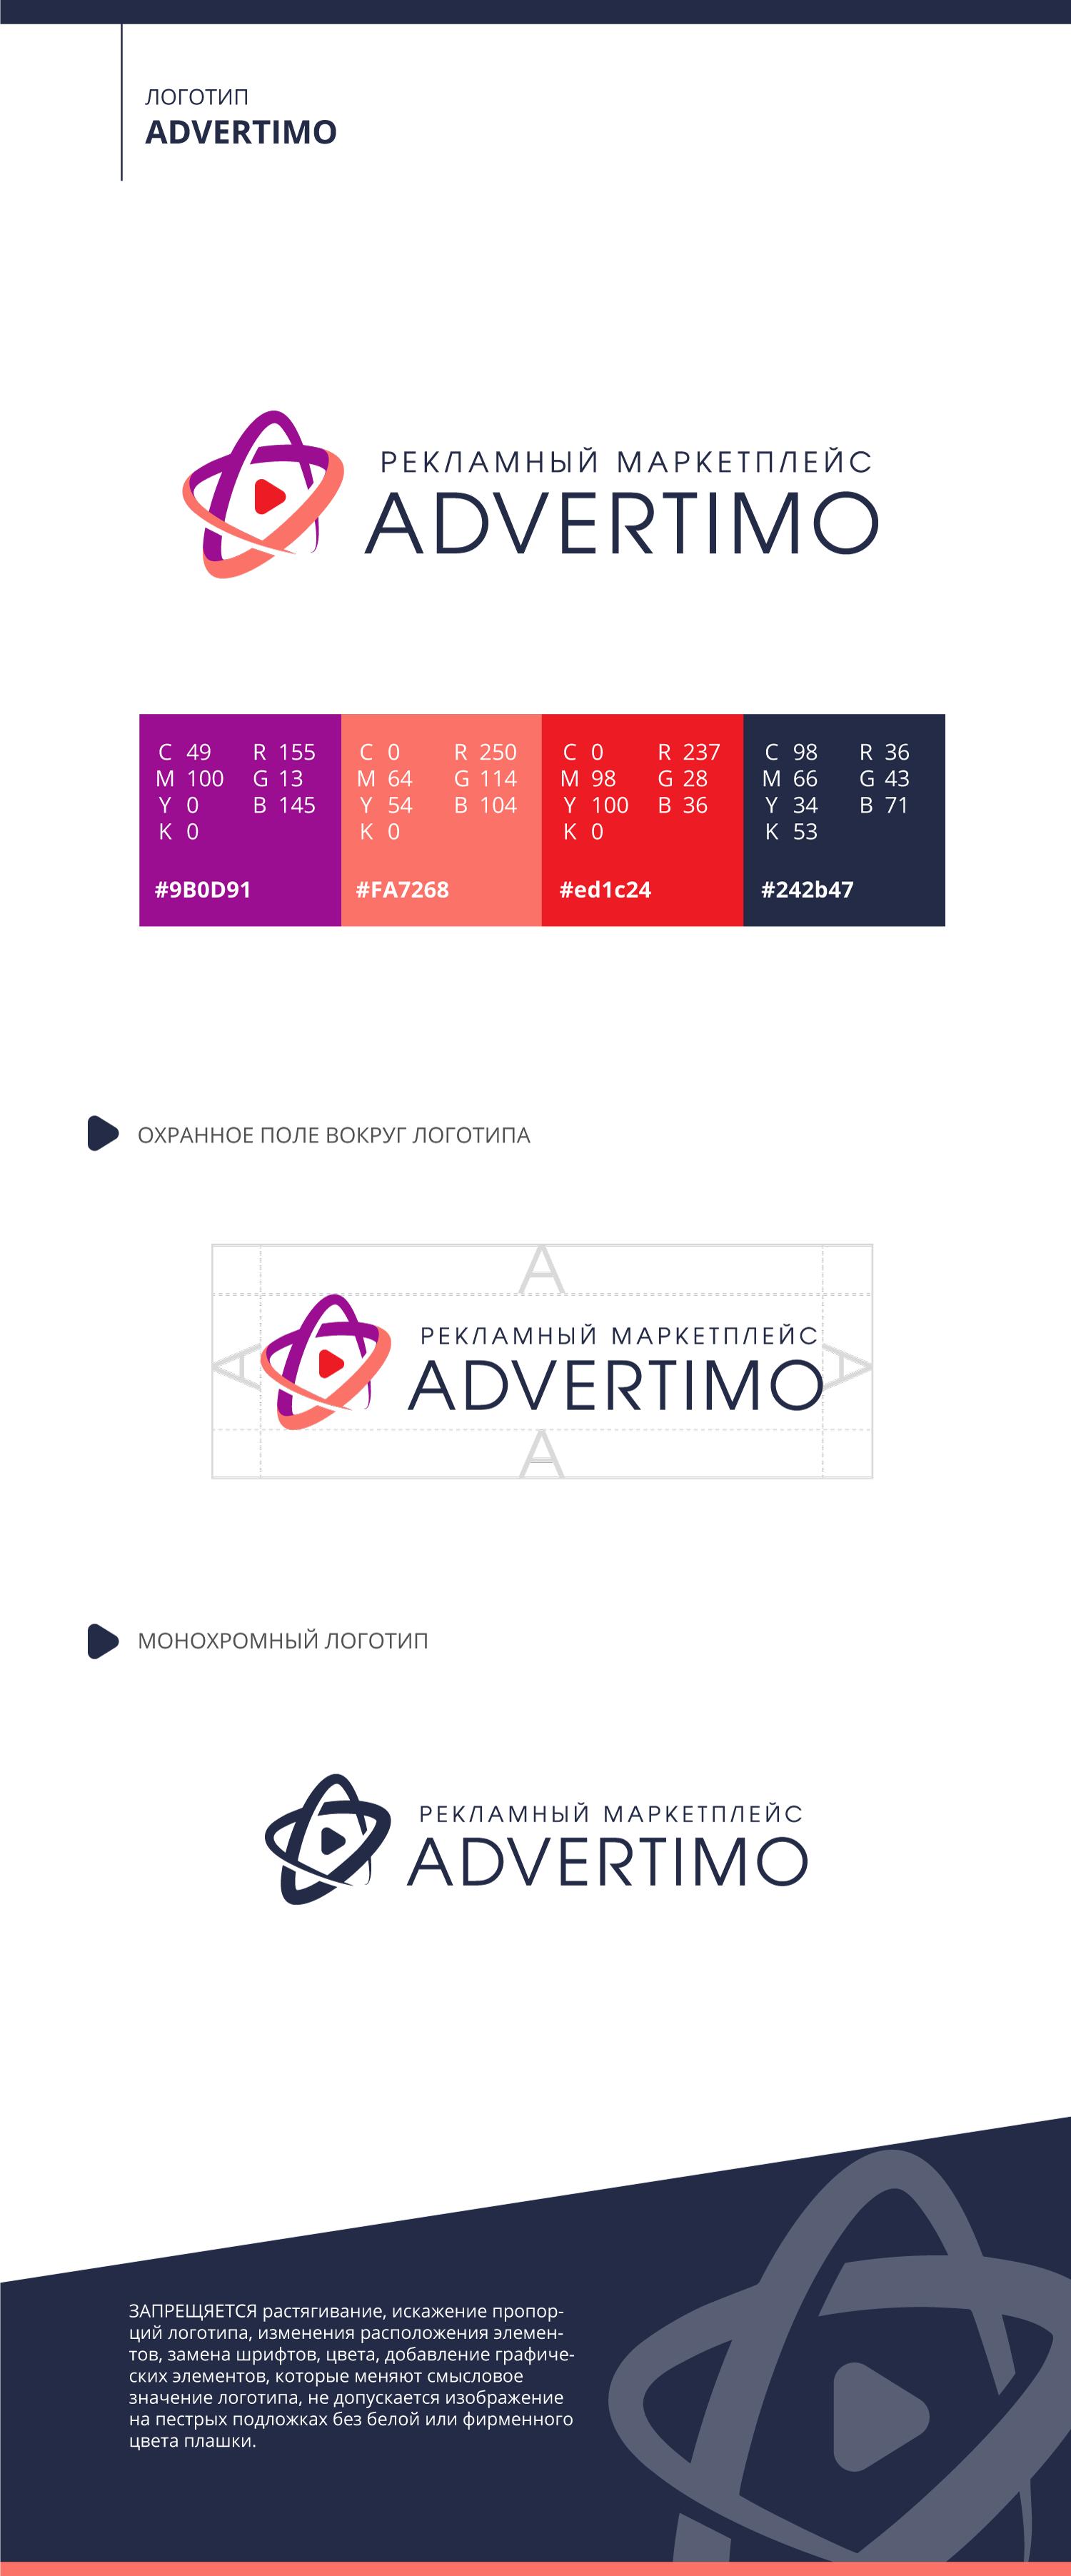 ADVERTIMO - рекламное инфлюенс-агентство